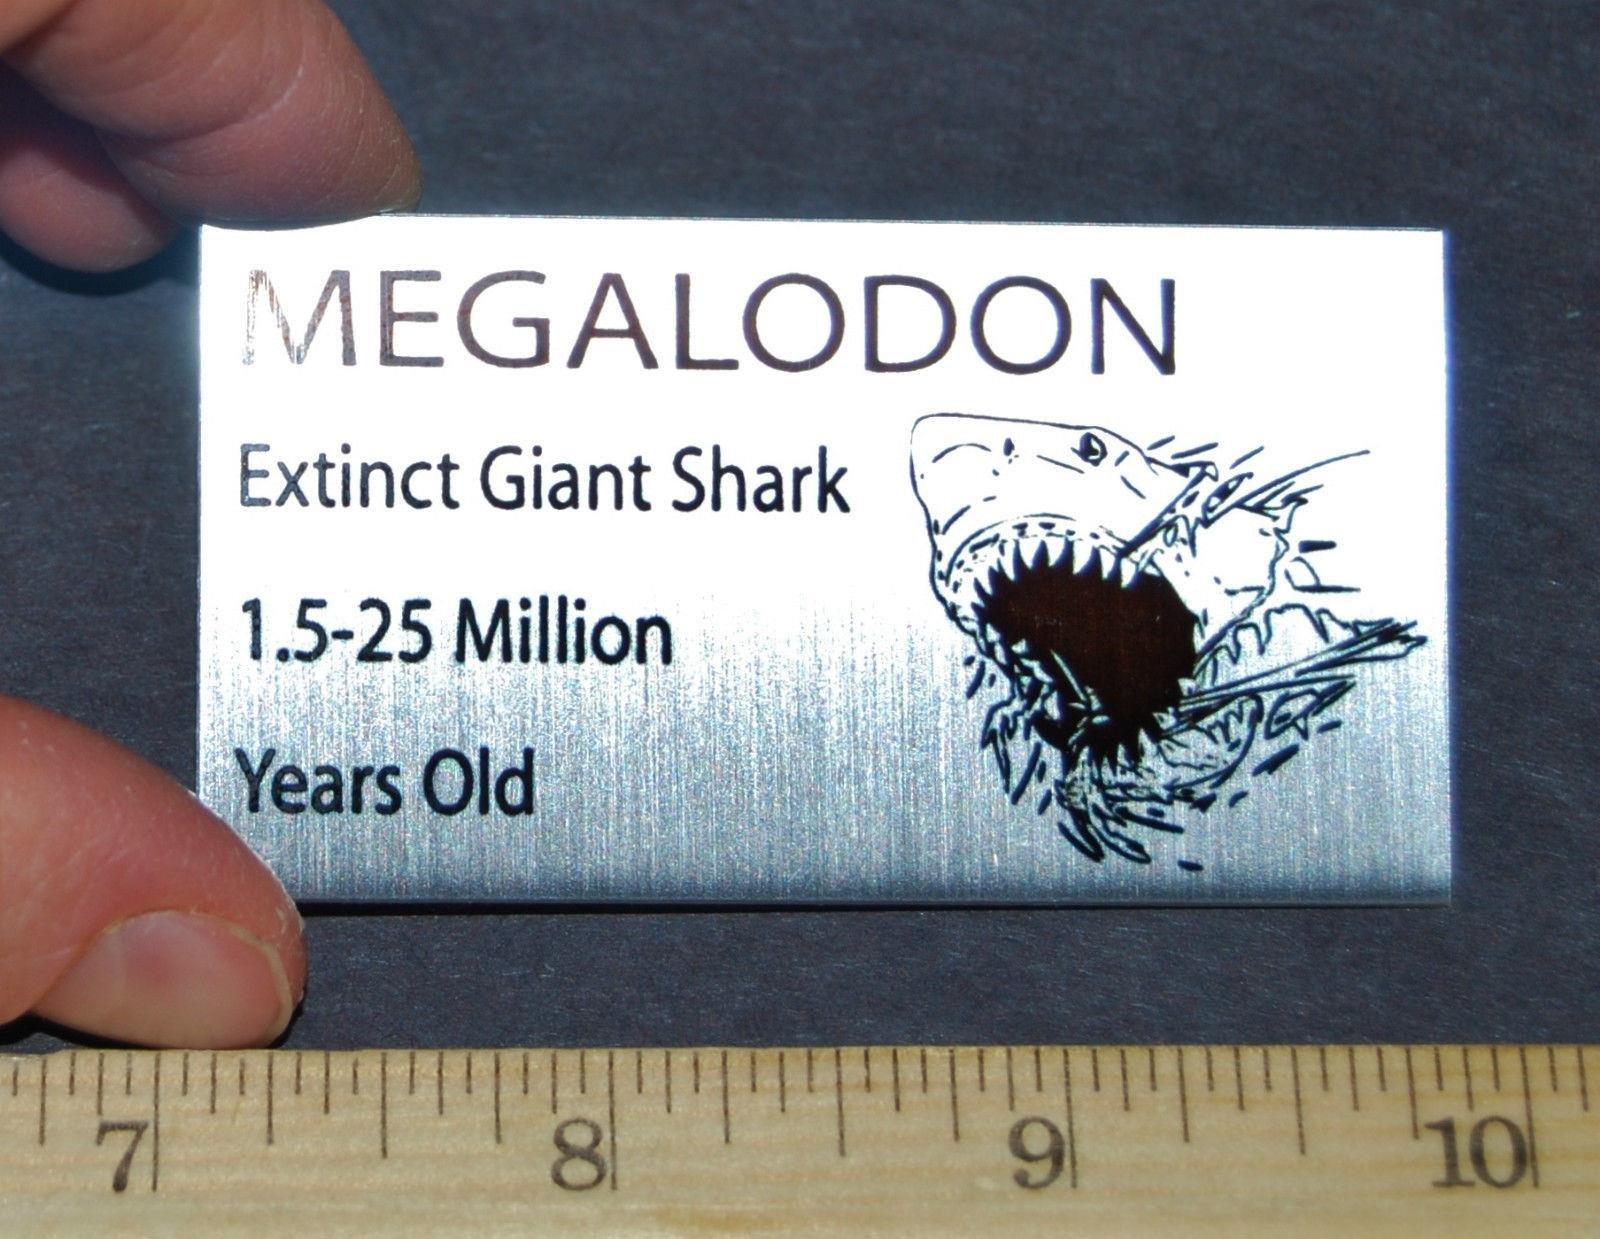 Buy MEGALODON Tooth Fossil Extinct Shark Metal Display Label